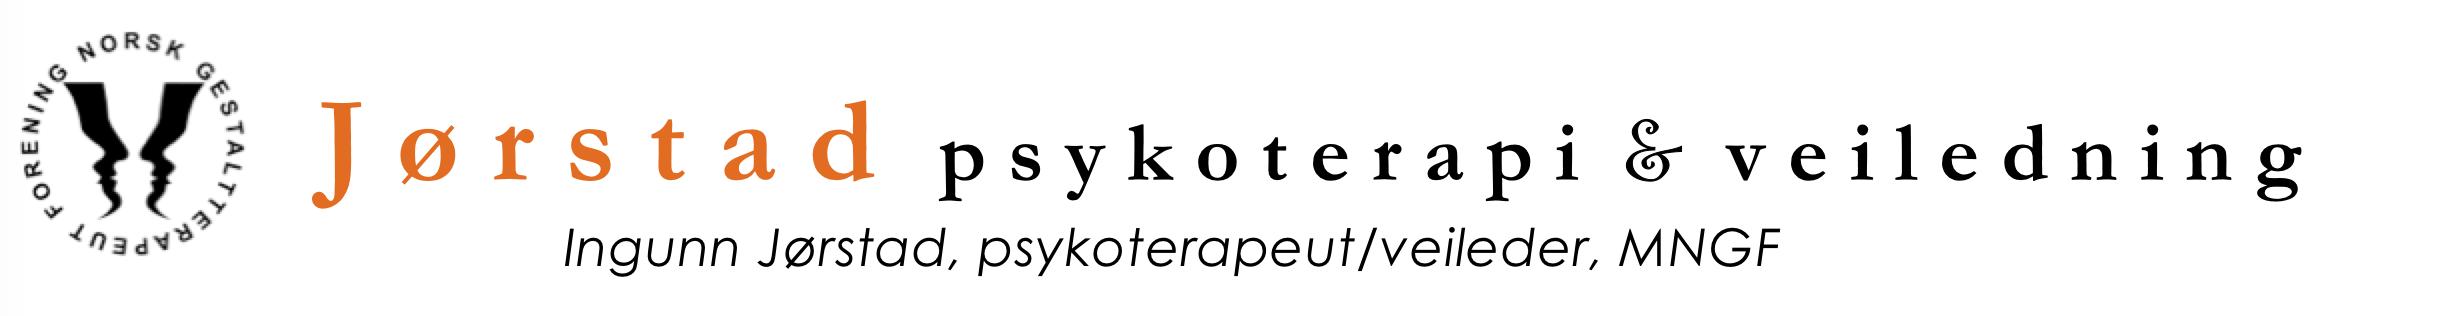 Jørstad psykoterapi & veiledning / Rosenkrantz' gate 10a, 0159 Oslo / tlf: 91536001 / epost: ingunn@psykoterapeut.no